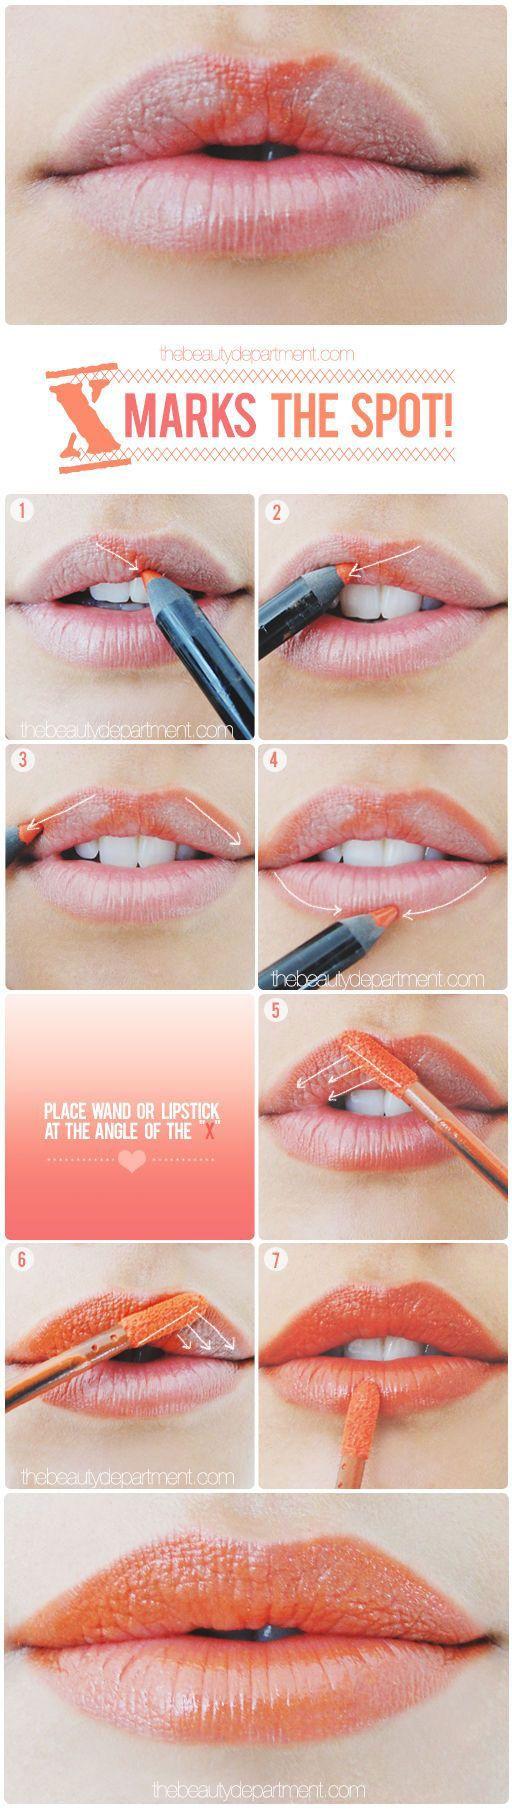 lipstick tips and tricks